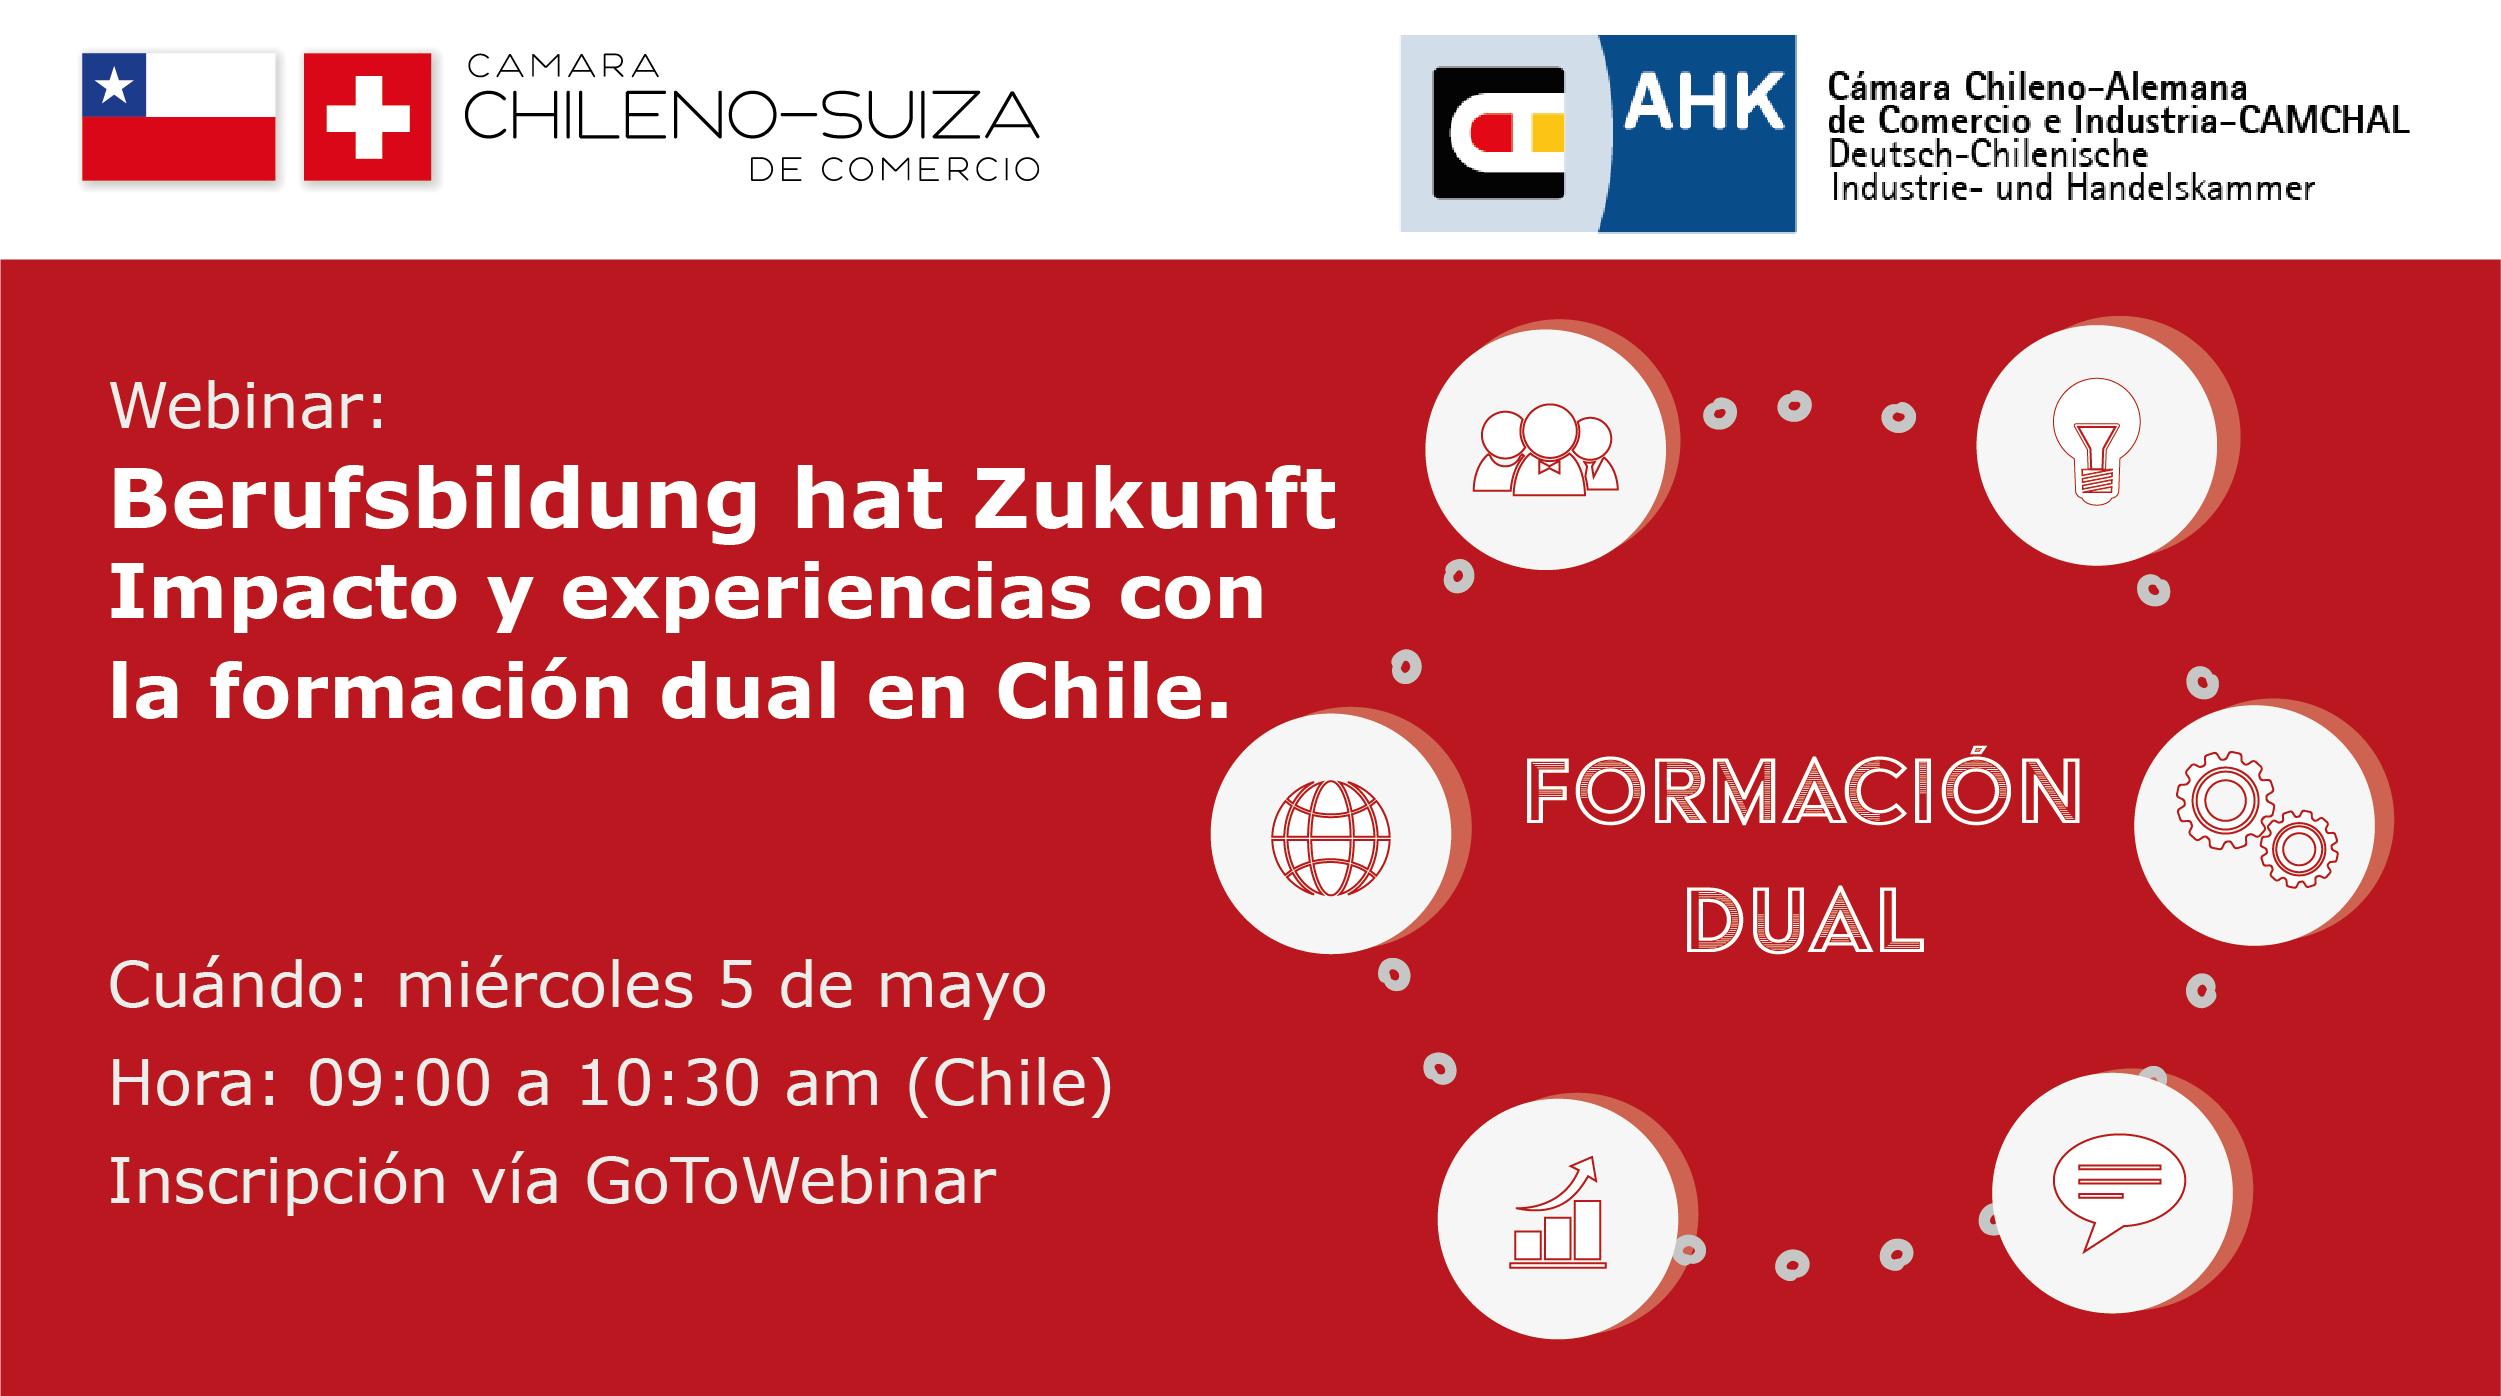 EDUCACION DUAL - Camara chileno suiza - Camara Chileno Alemana